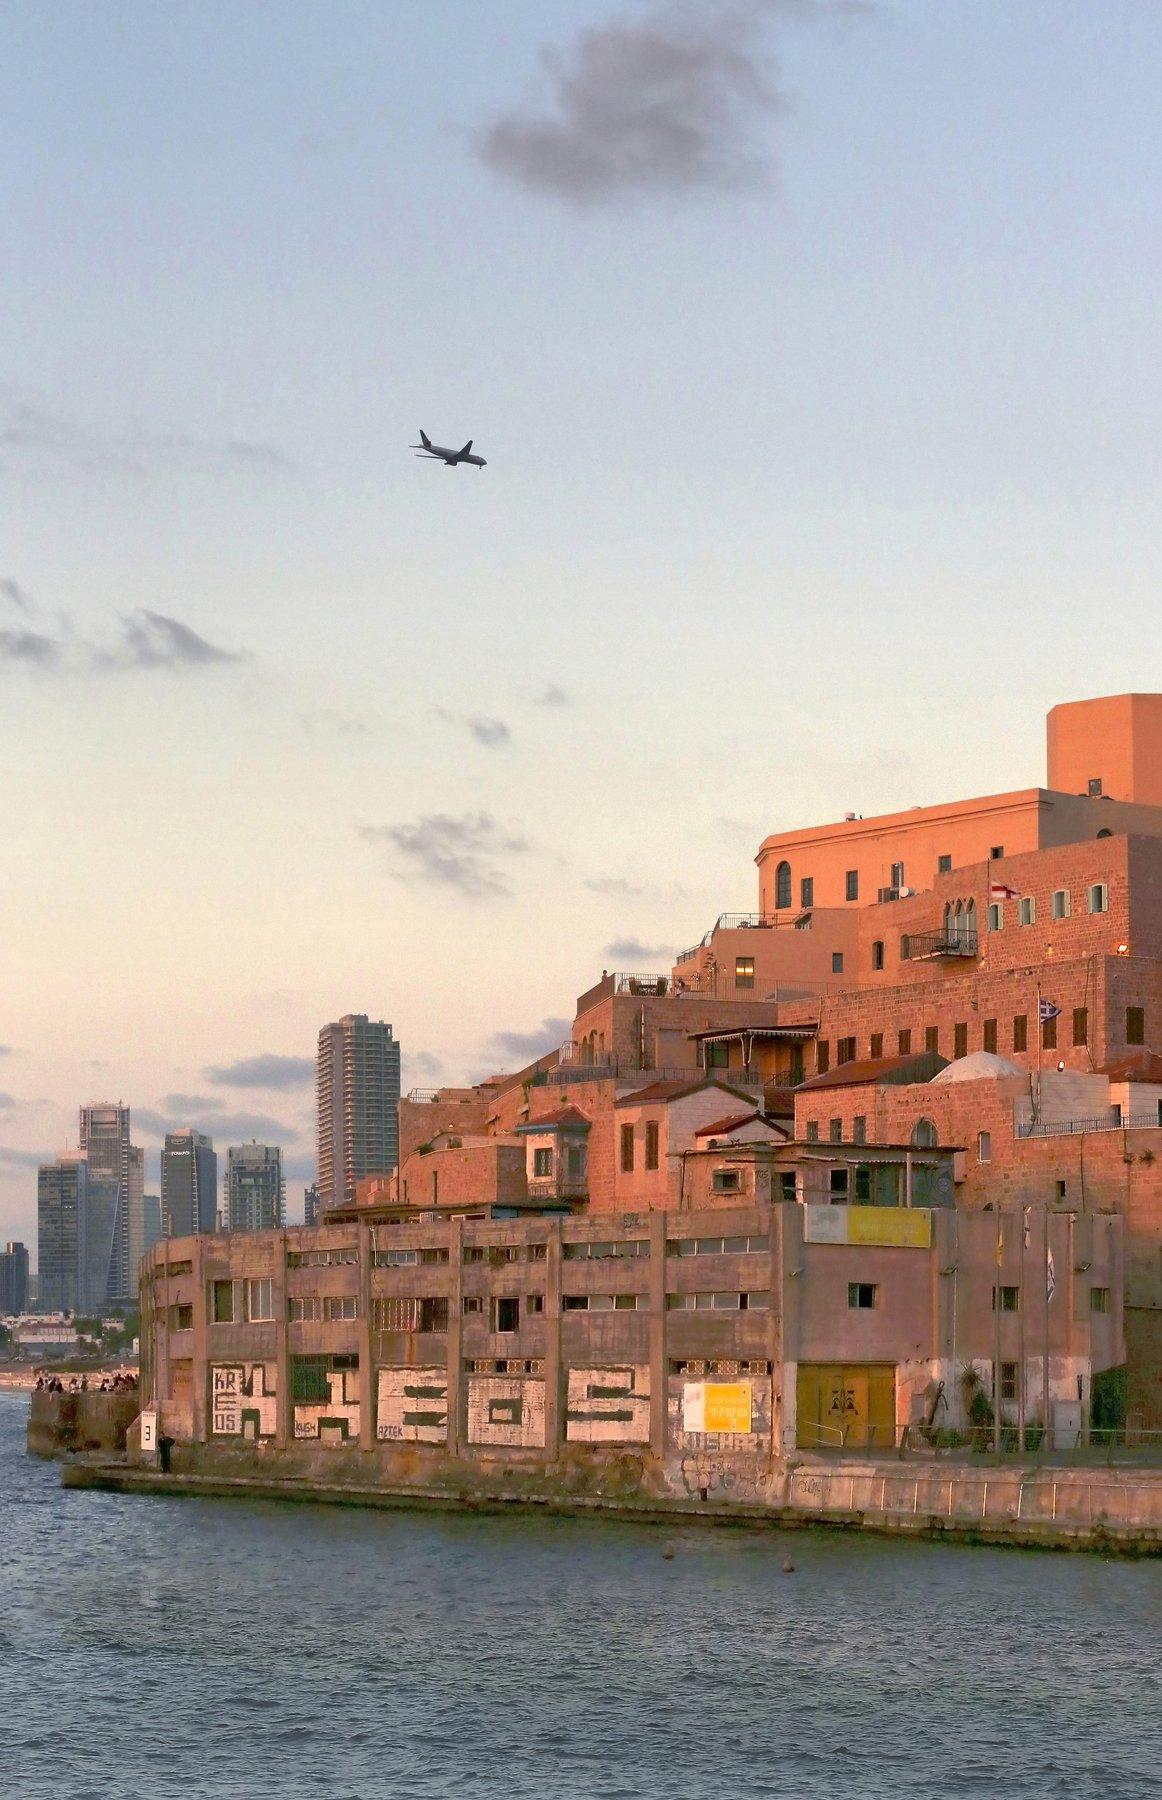 Old port, Yaffo, Израиль, Старый порт, Тель авив, Яффо, troofel